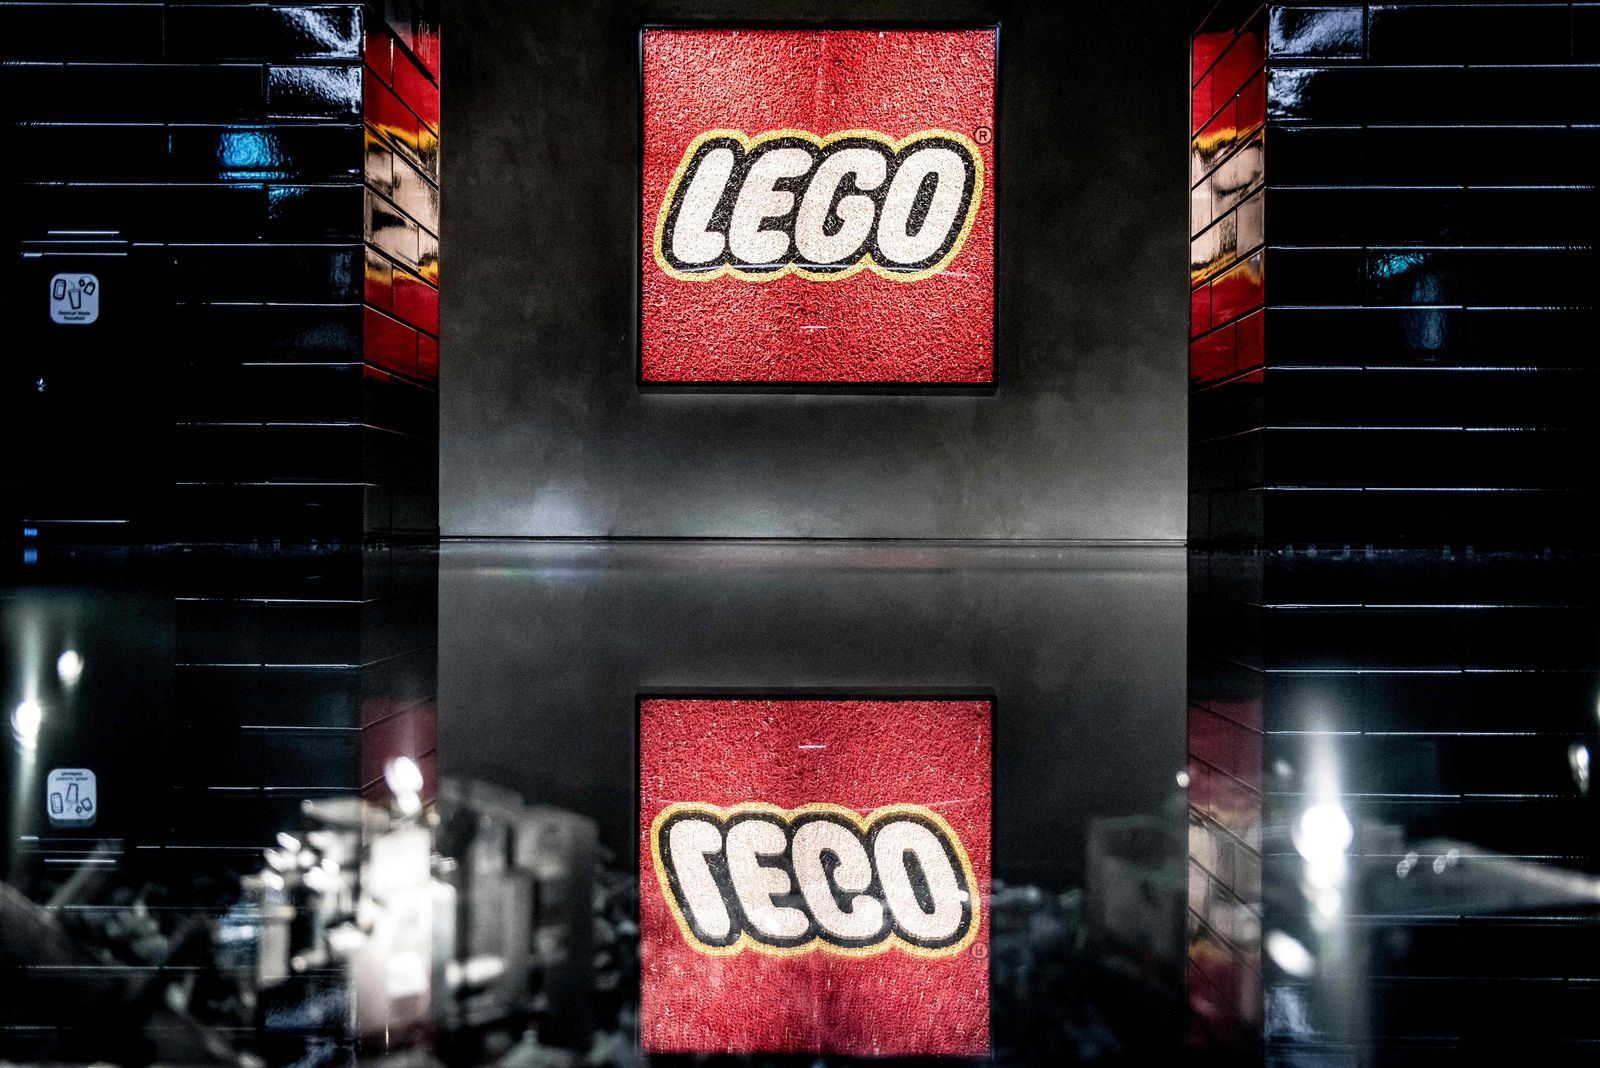 DENMARK-COMPANY-LEGO-EARNINGS